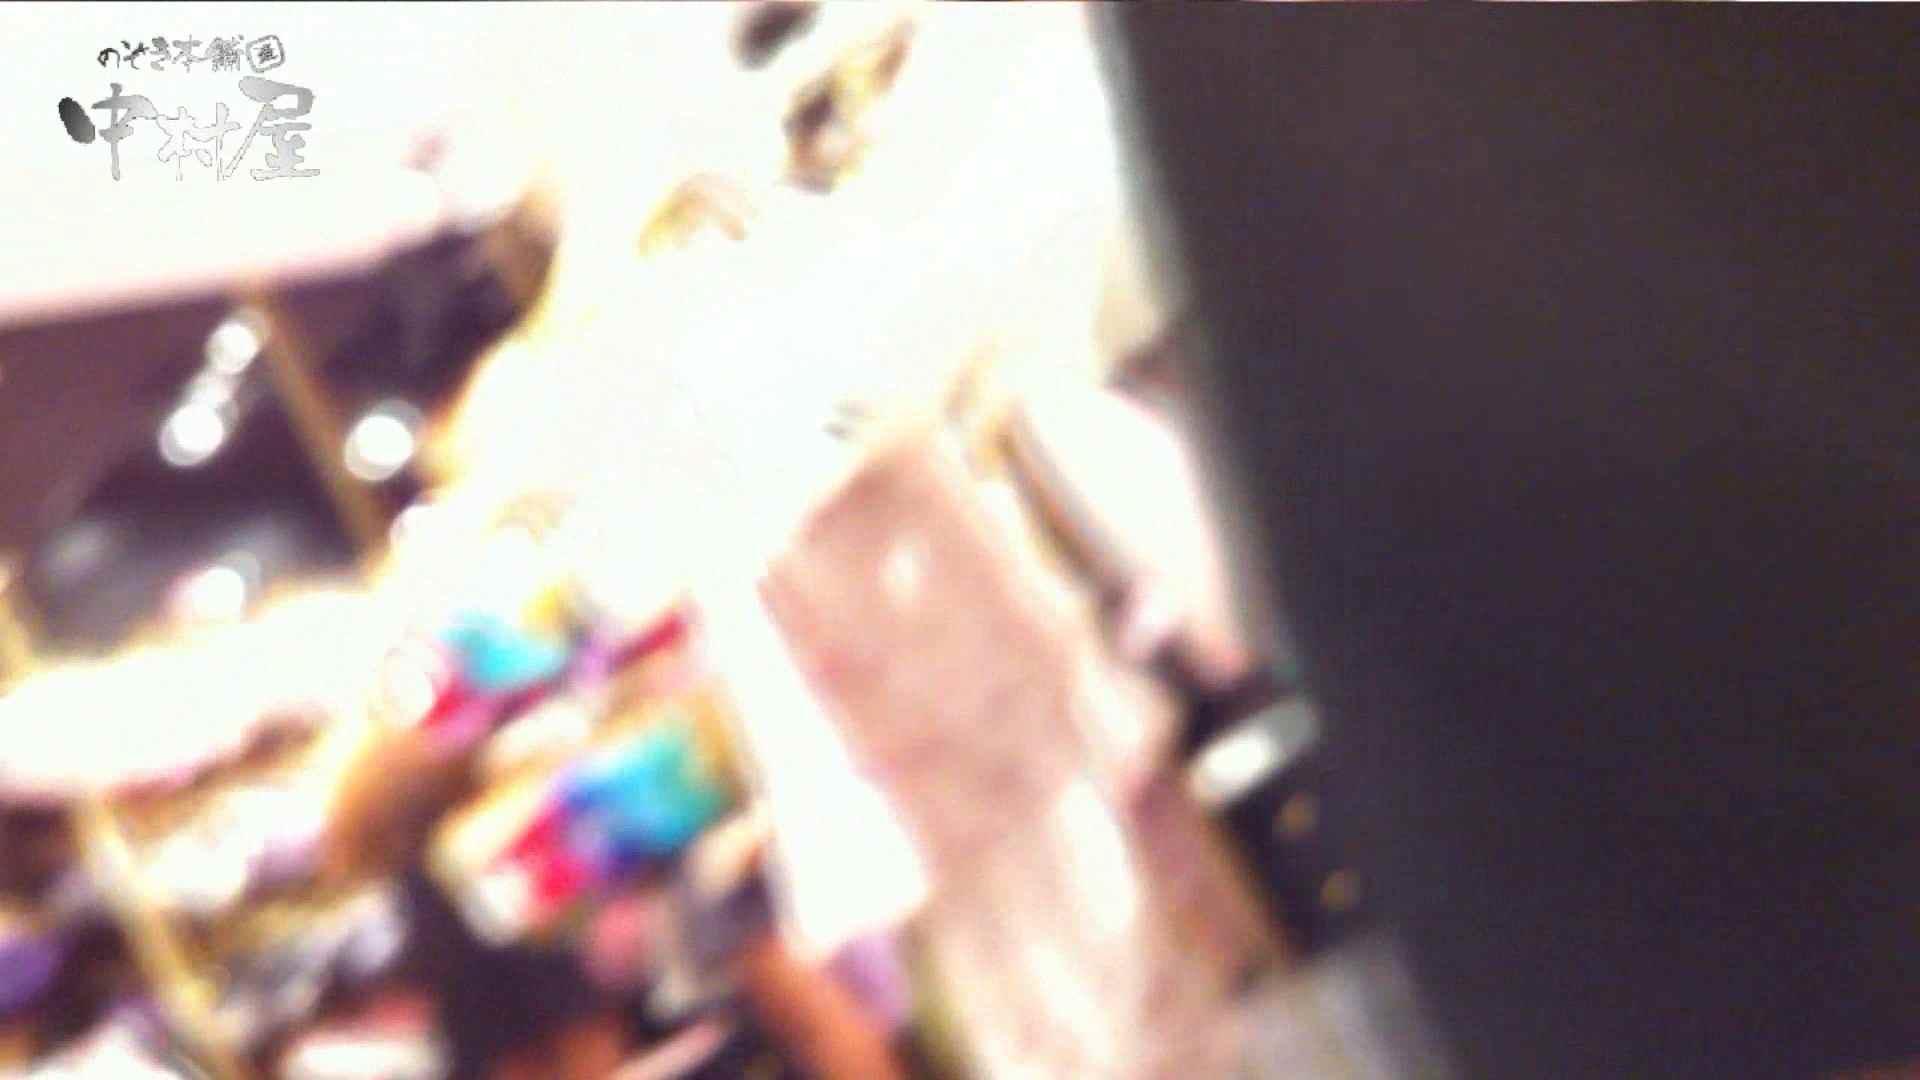 vol.47 カリスマ店員胸チラ&パンチラ 黒パン店員さん パンチラ 盗撮動画紹介 79連発 63